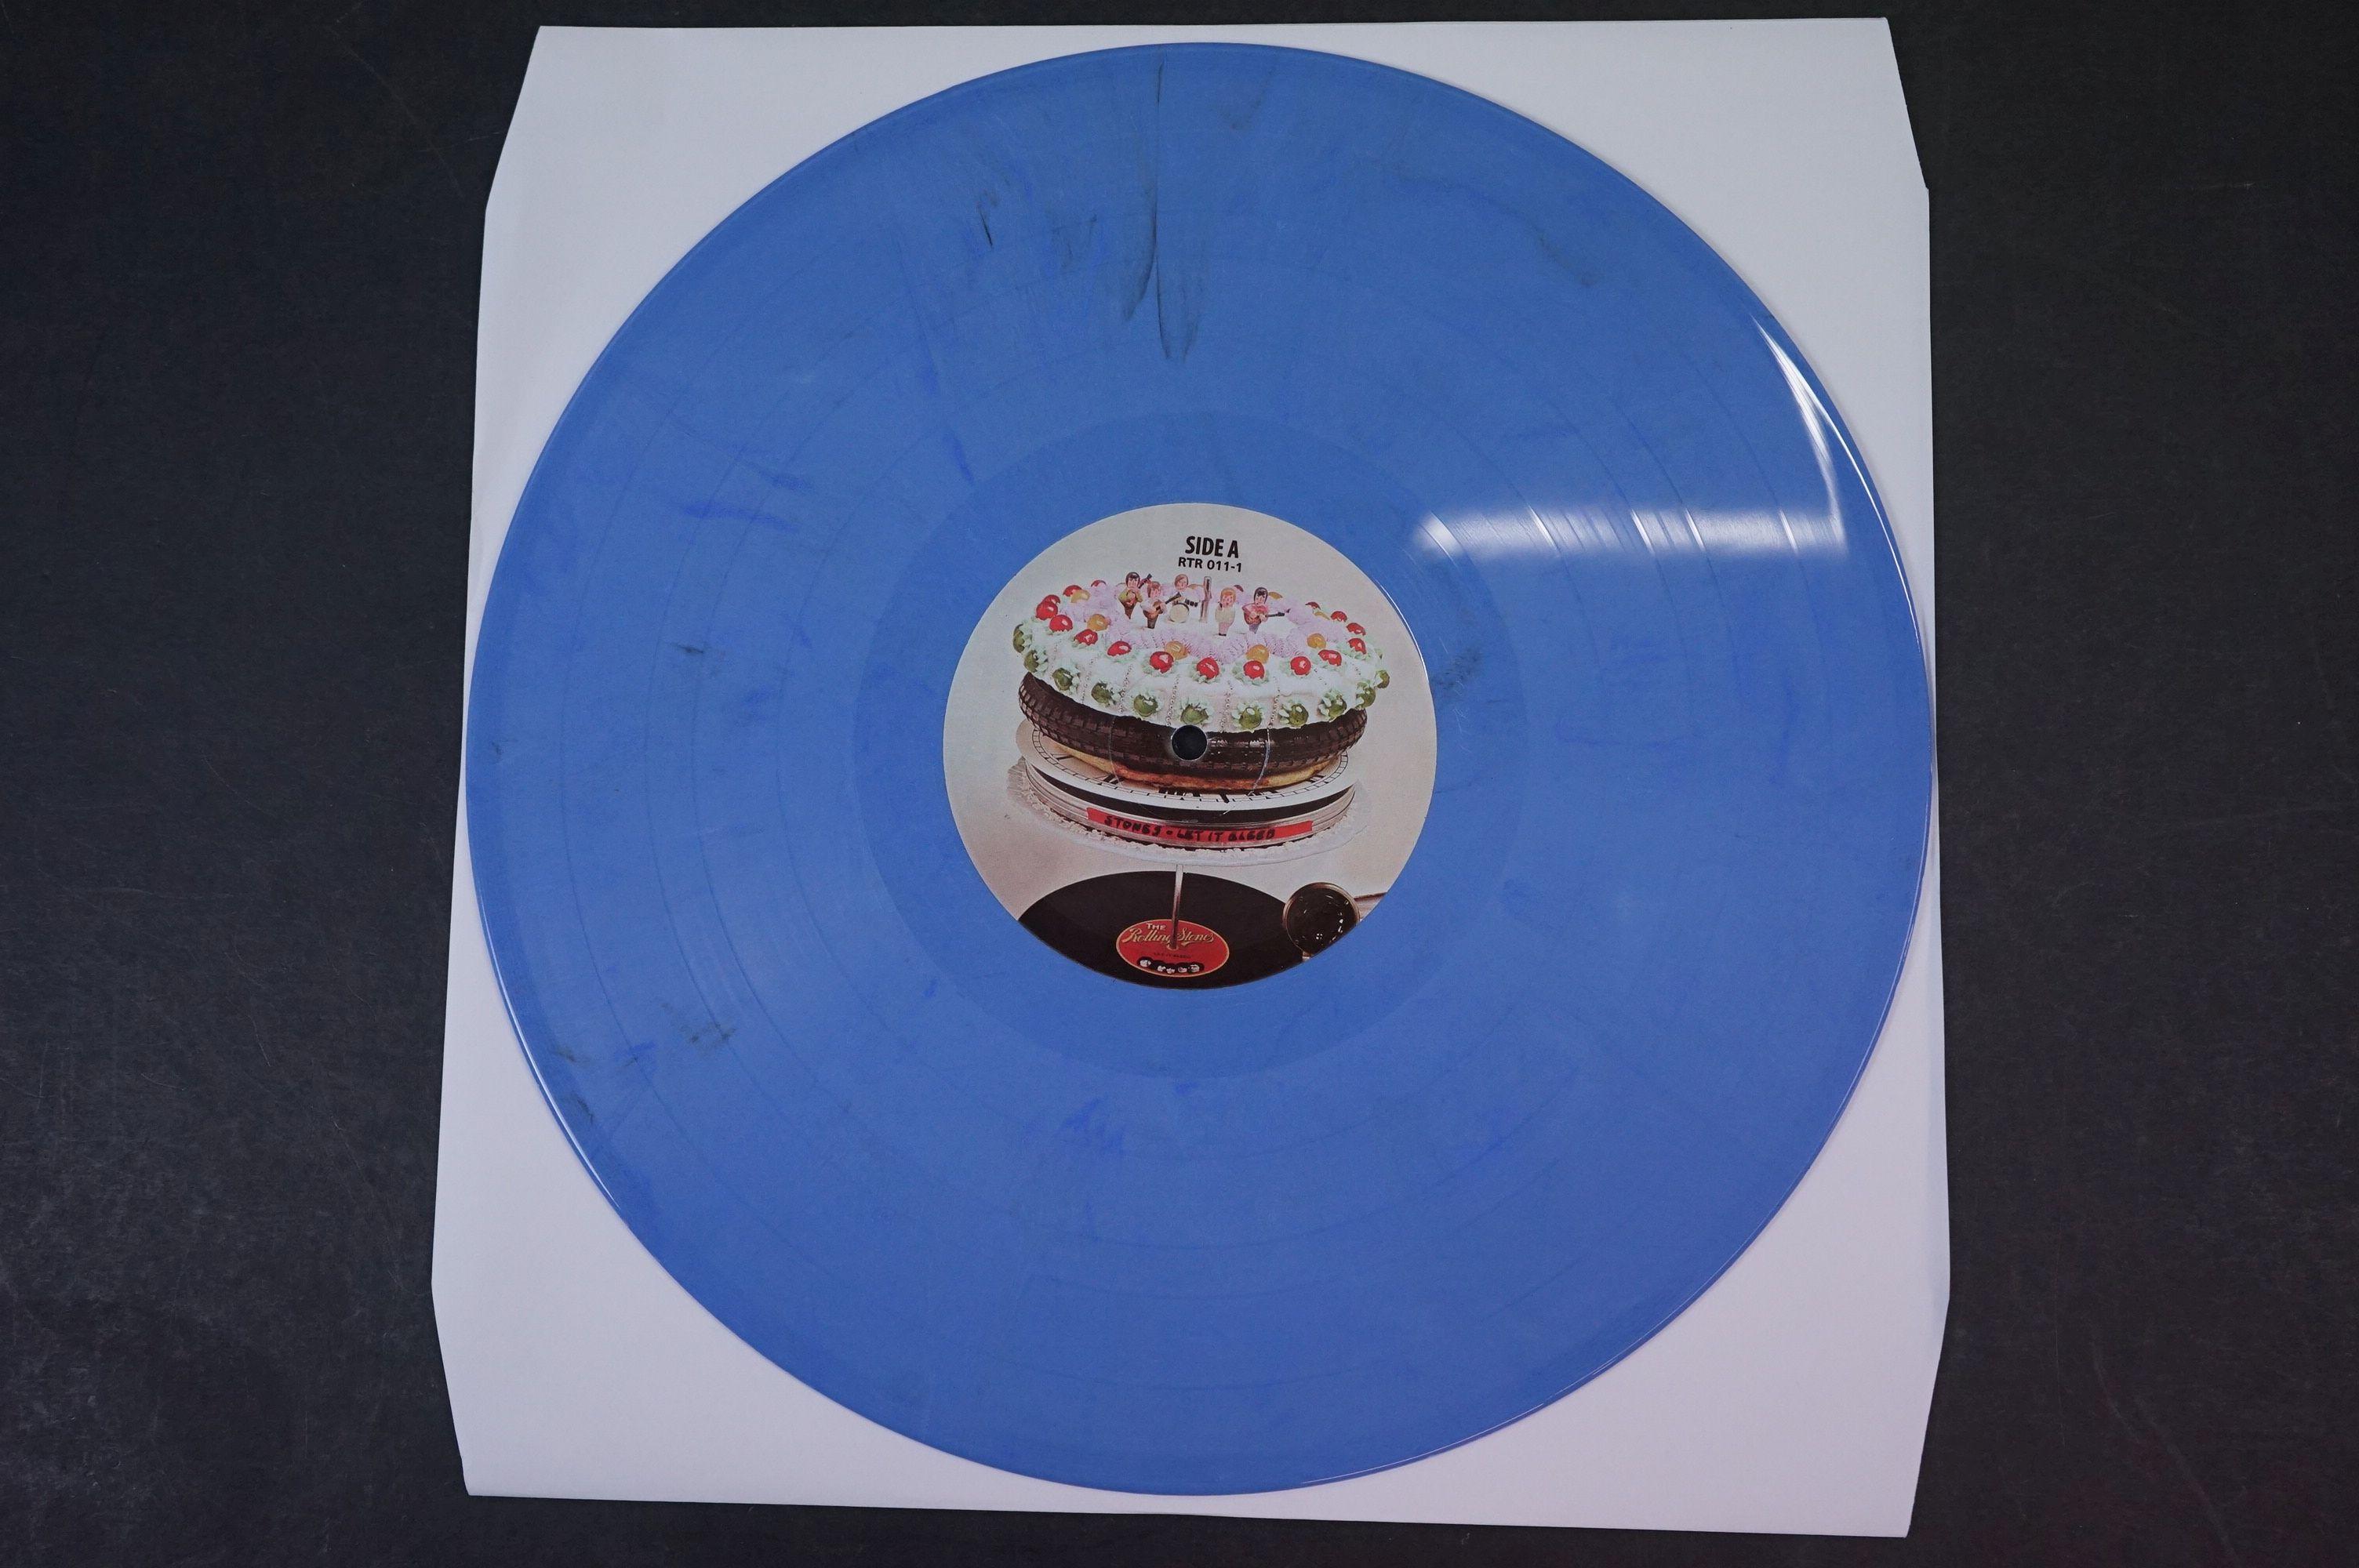 Vinyl - ltd edn The Real Alternate Album Rolling Stones Let It Bleed 3 LP / 2 CD Box Set RTR011, - Image 5 of 9